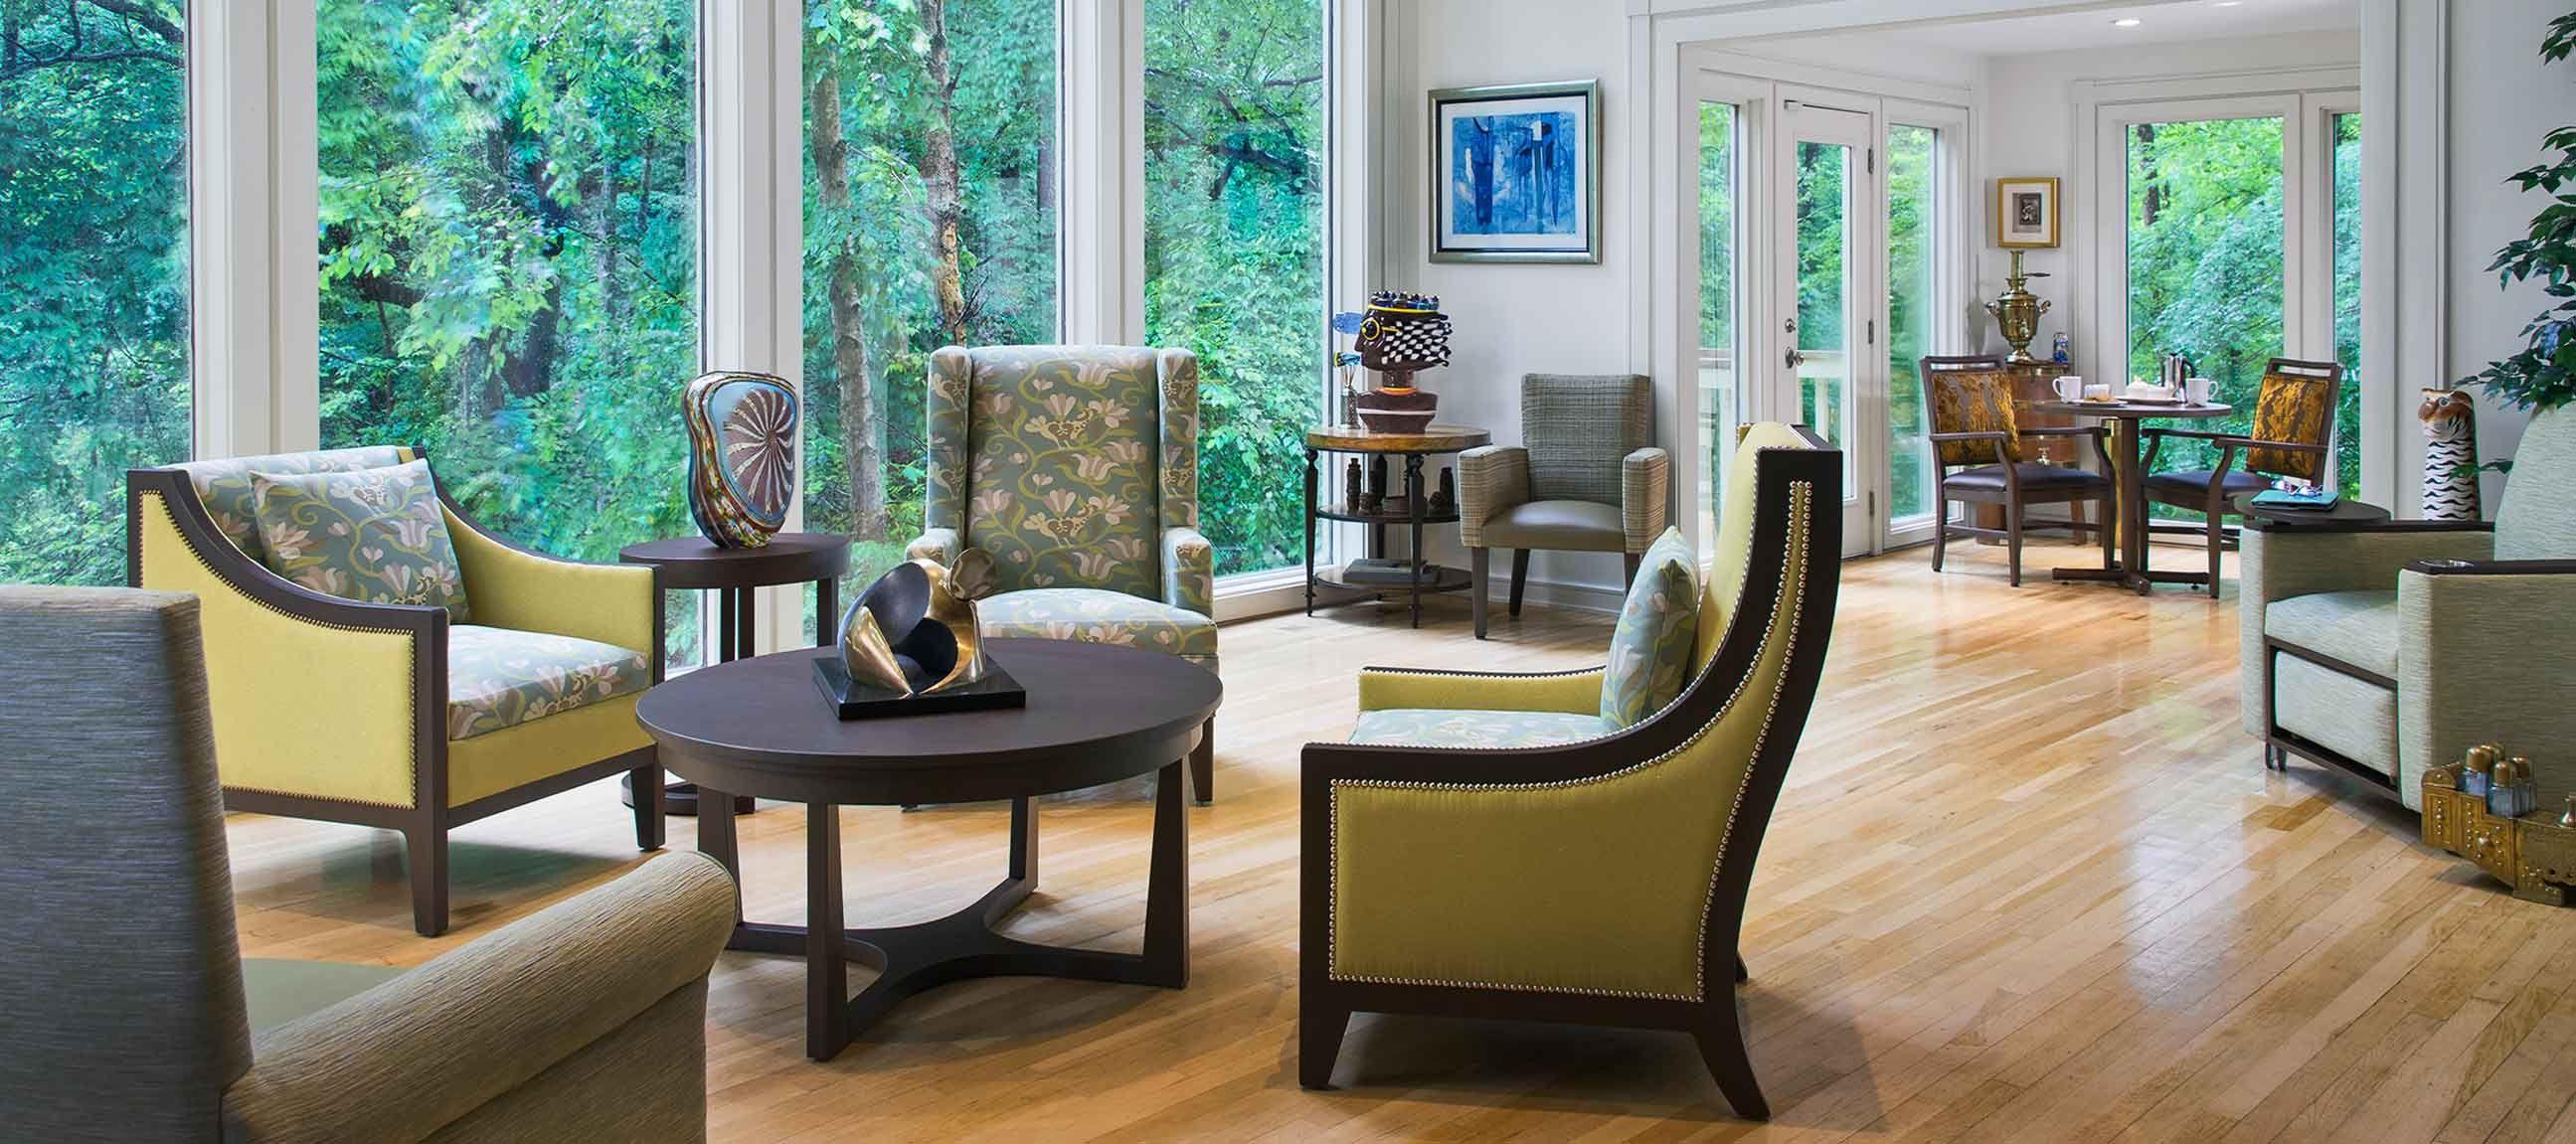 Kwalus senior living healthcare furniture is designed